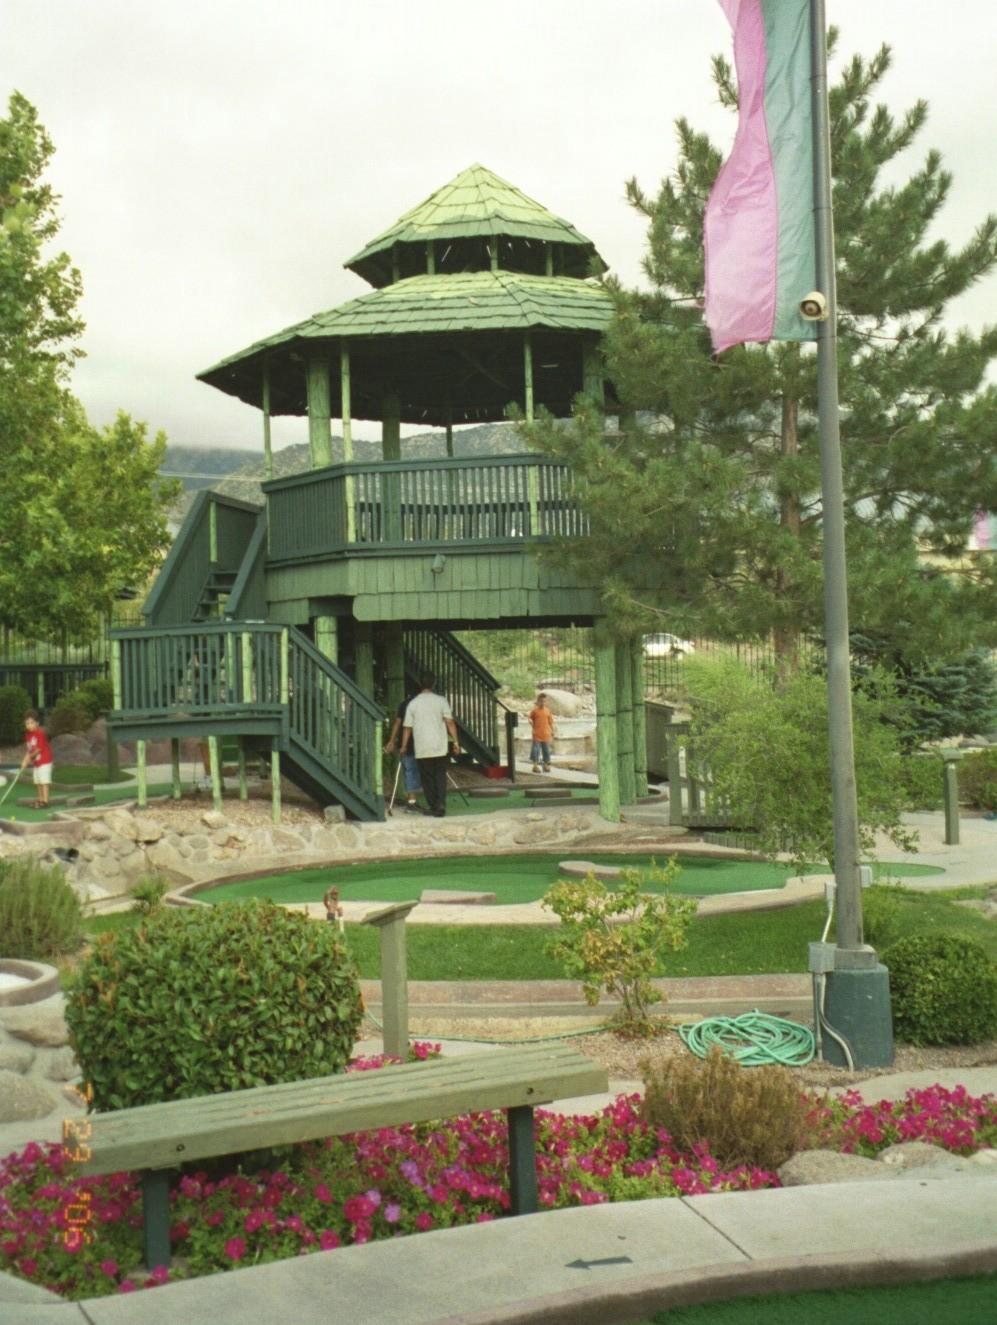 Hinkle Family Fun Center